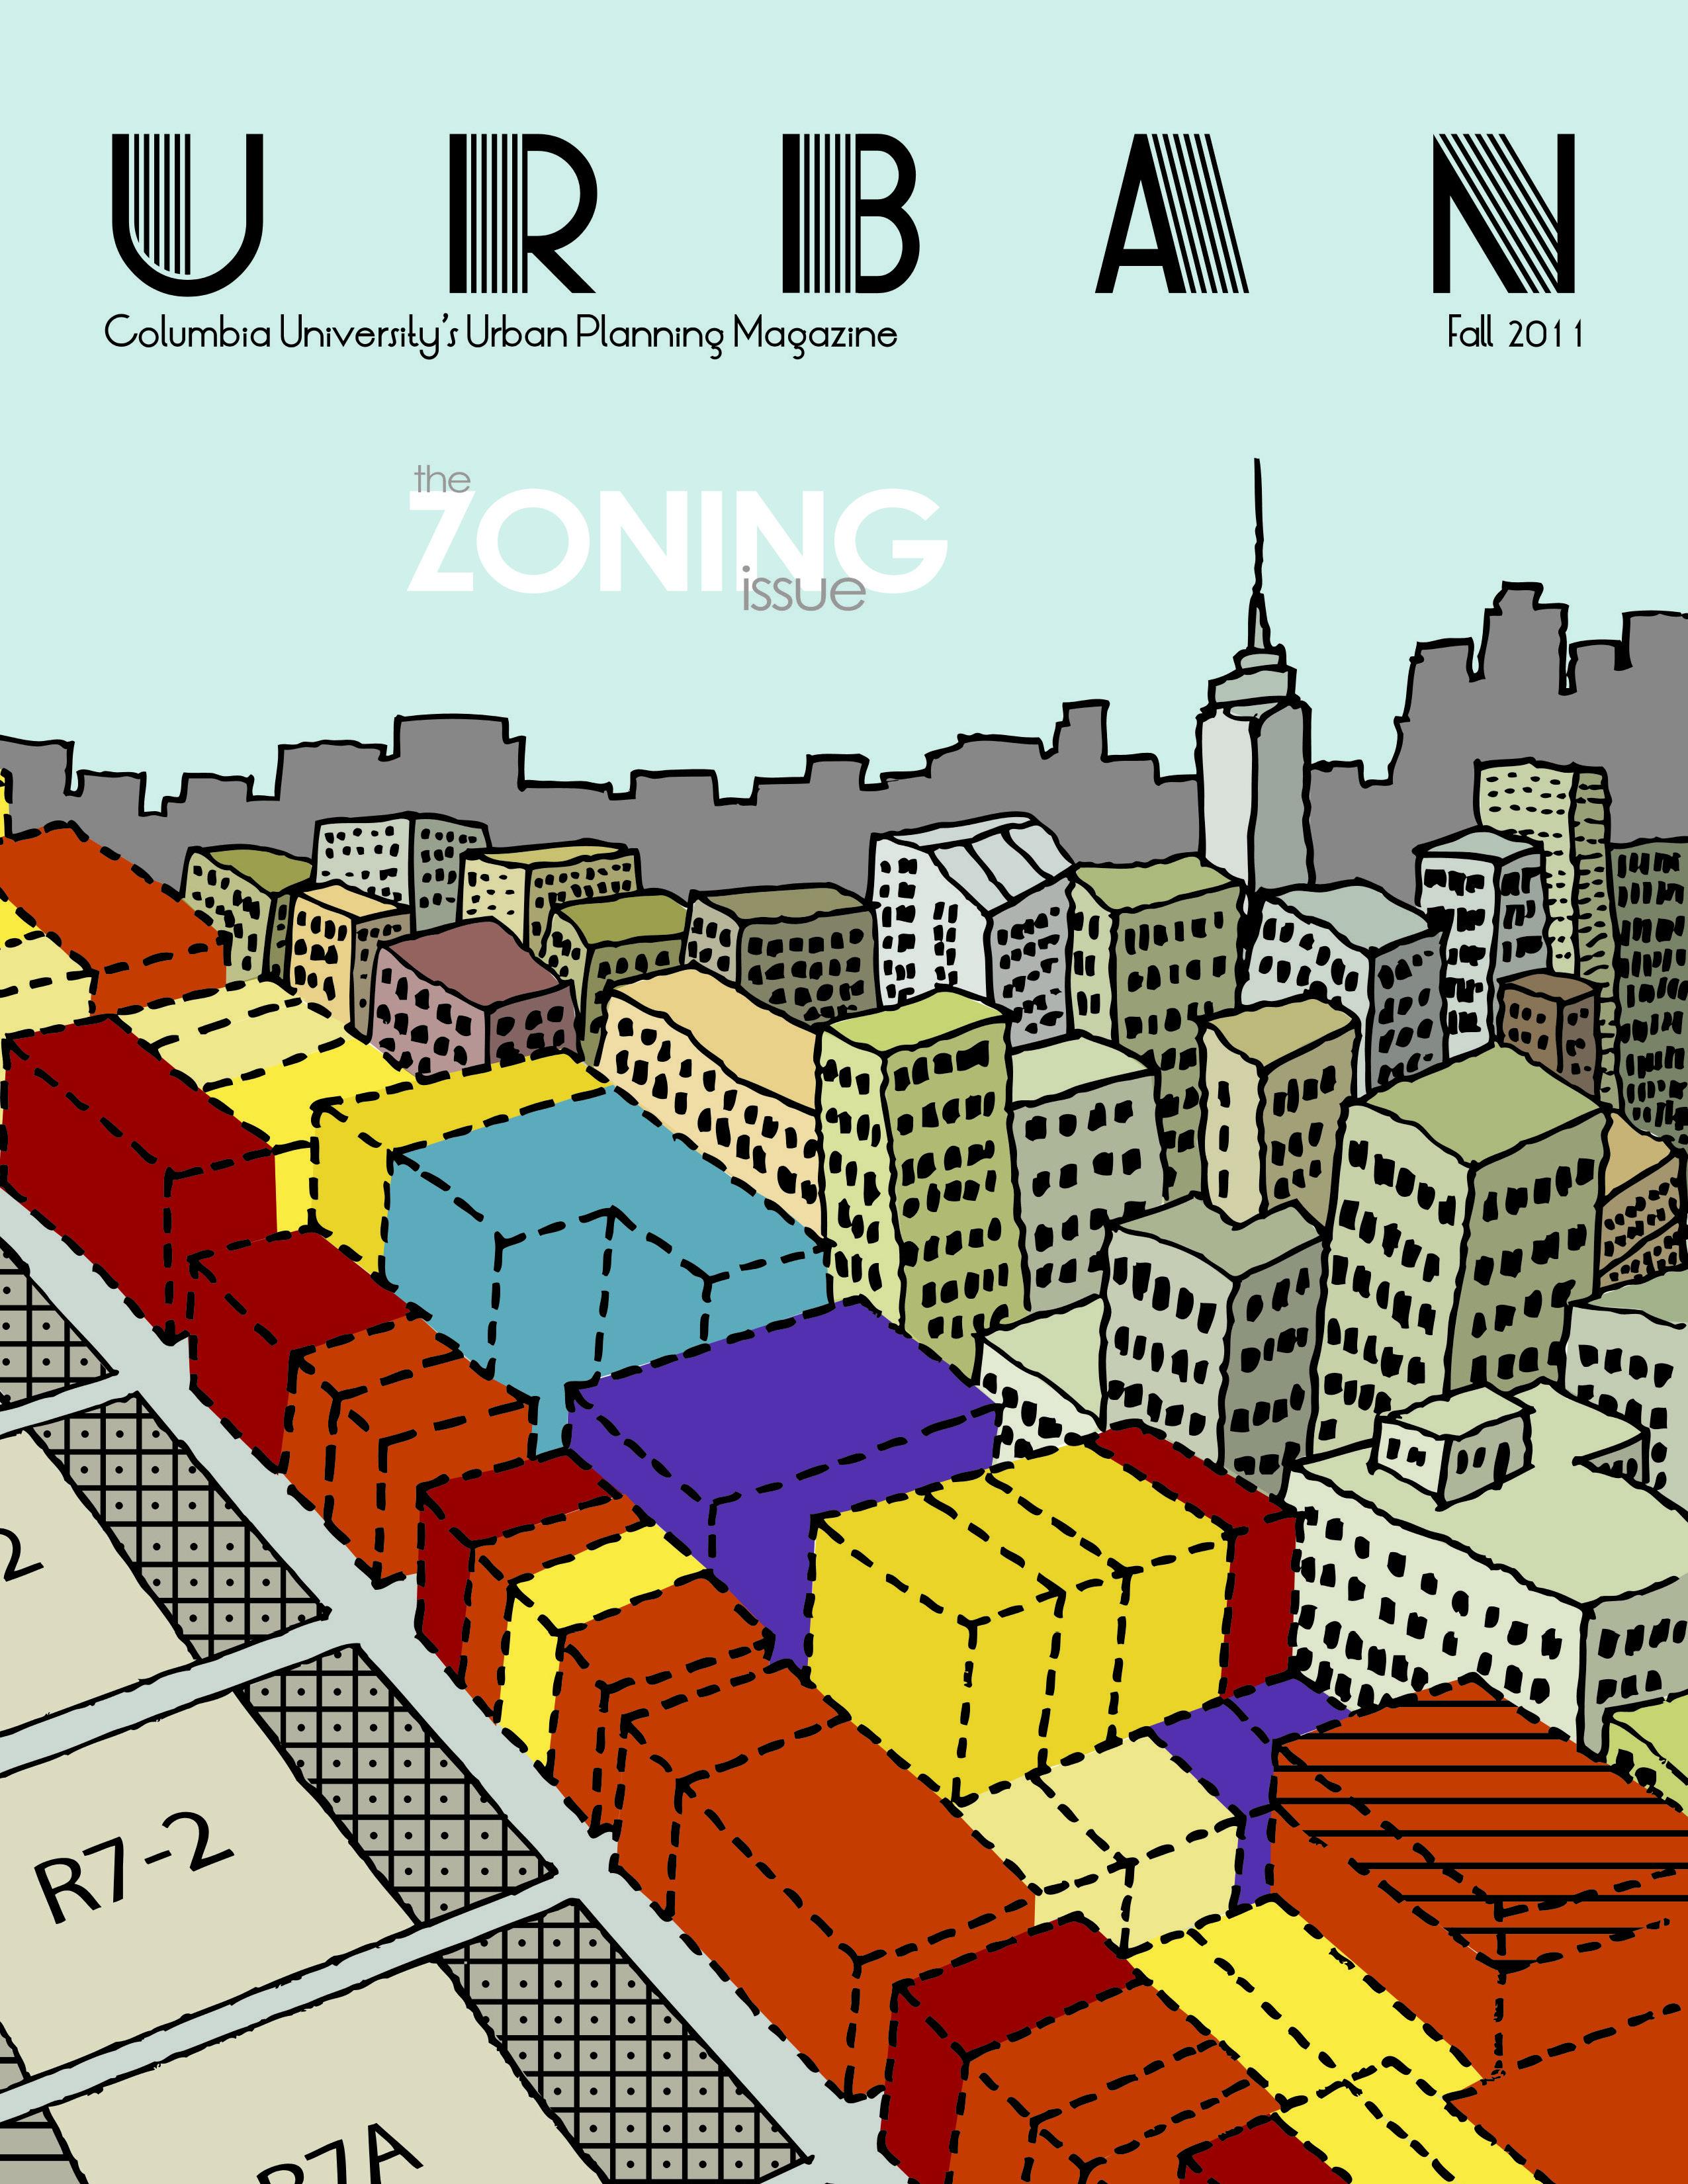 URBAN Magazine  Graduate School of Architecture Planning and Preservation